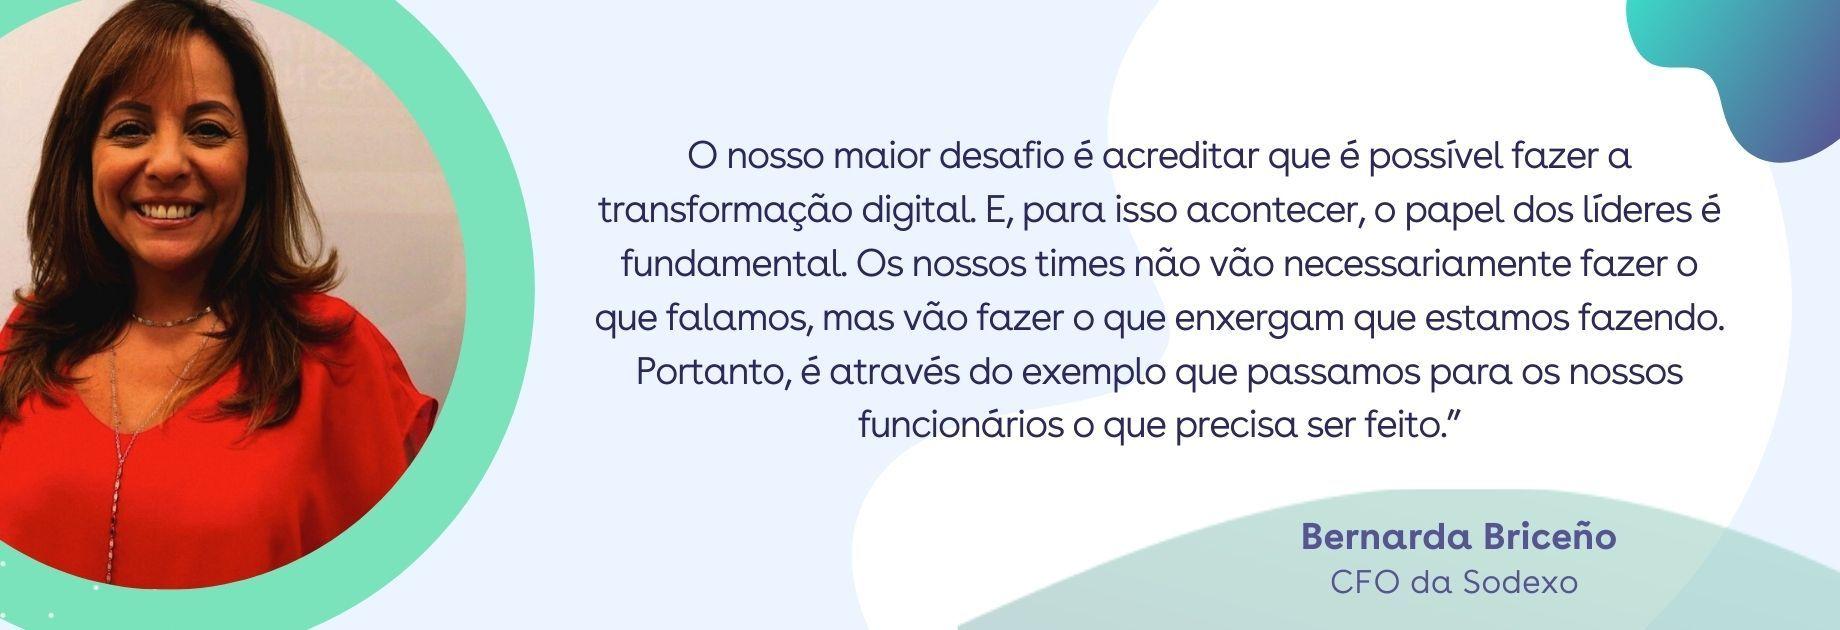 Futuro Digital - Bernarda Briceño- CFO Sodexo